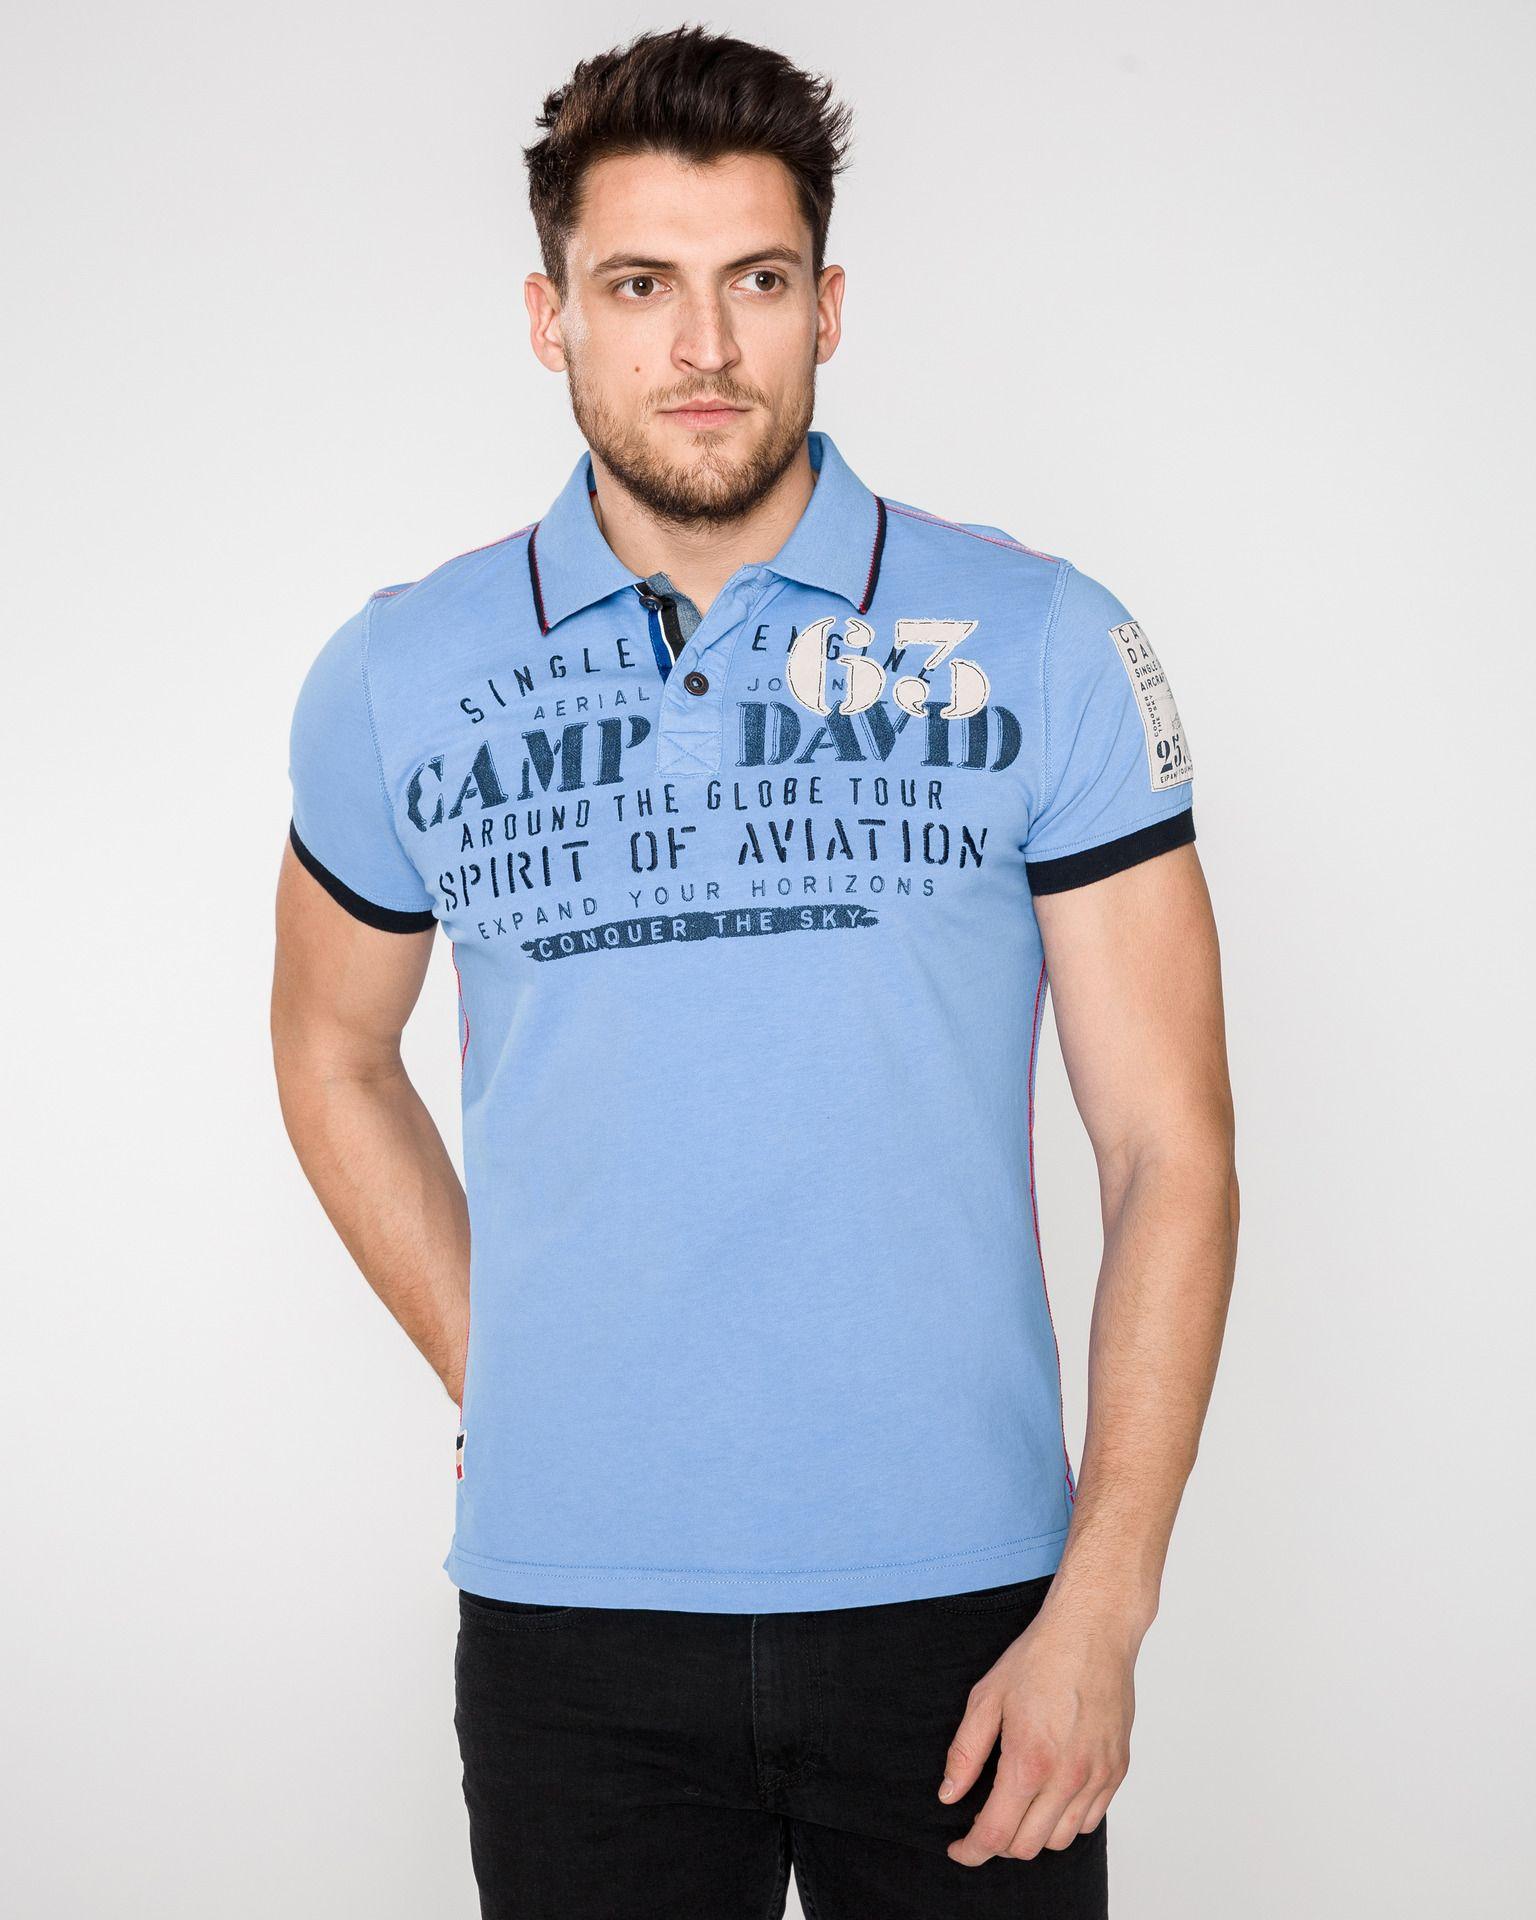 Camp David Polo Shirts Creative Designs For Leisure Polo Shirt